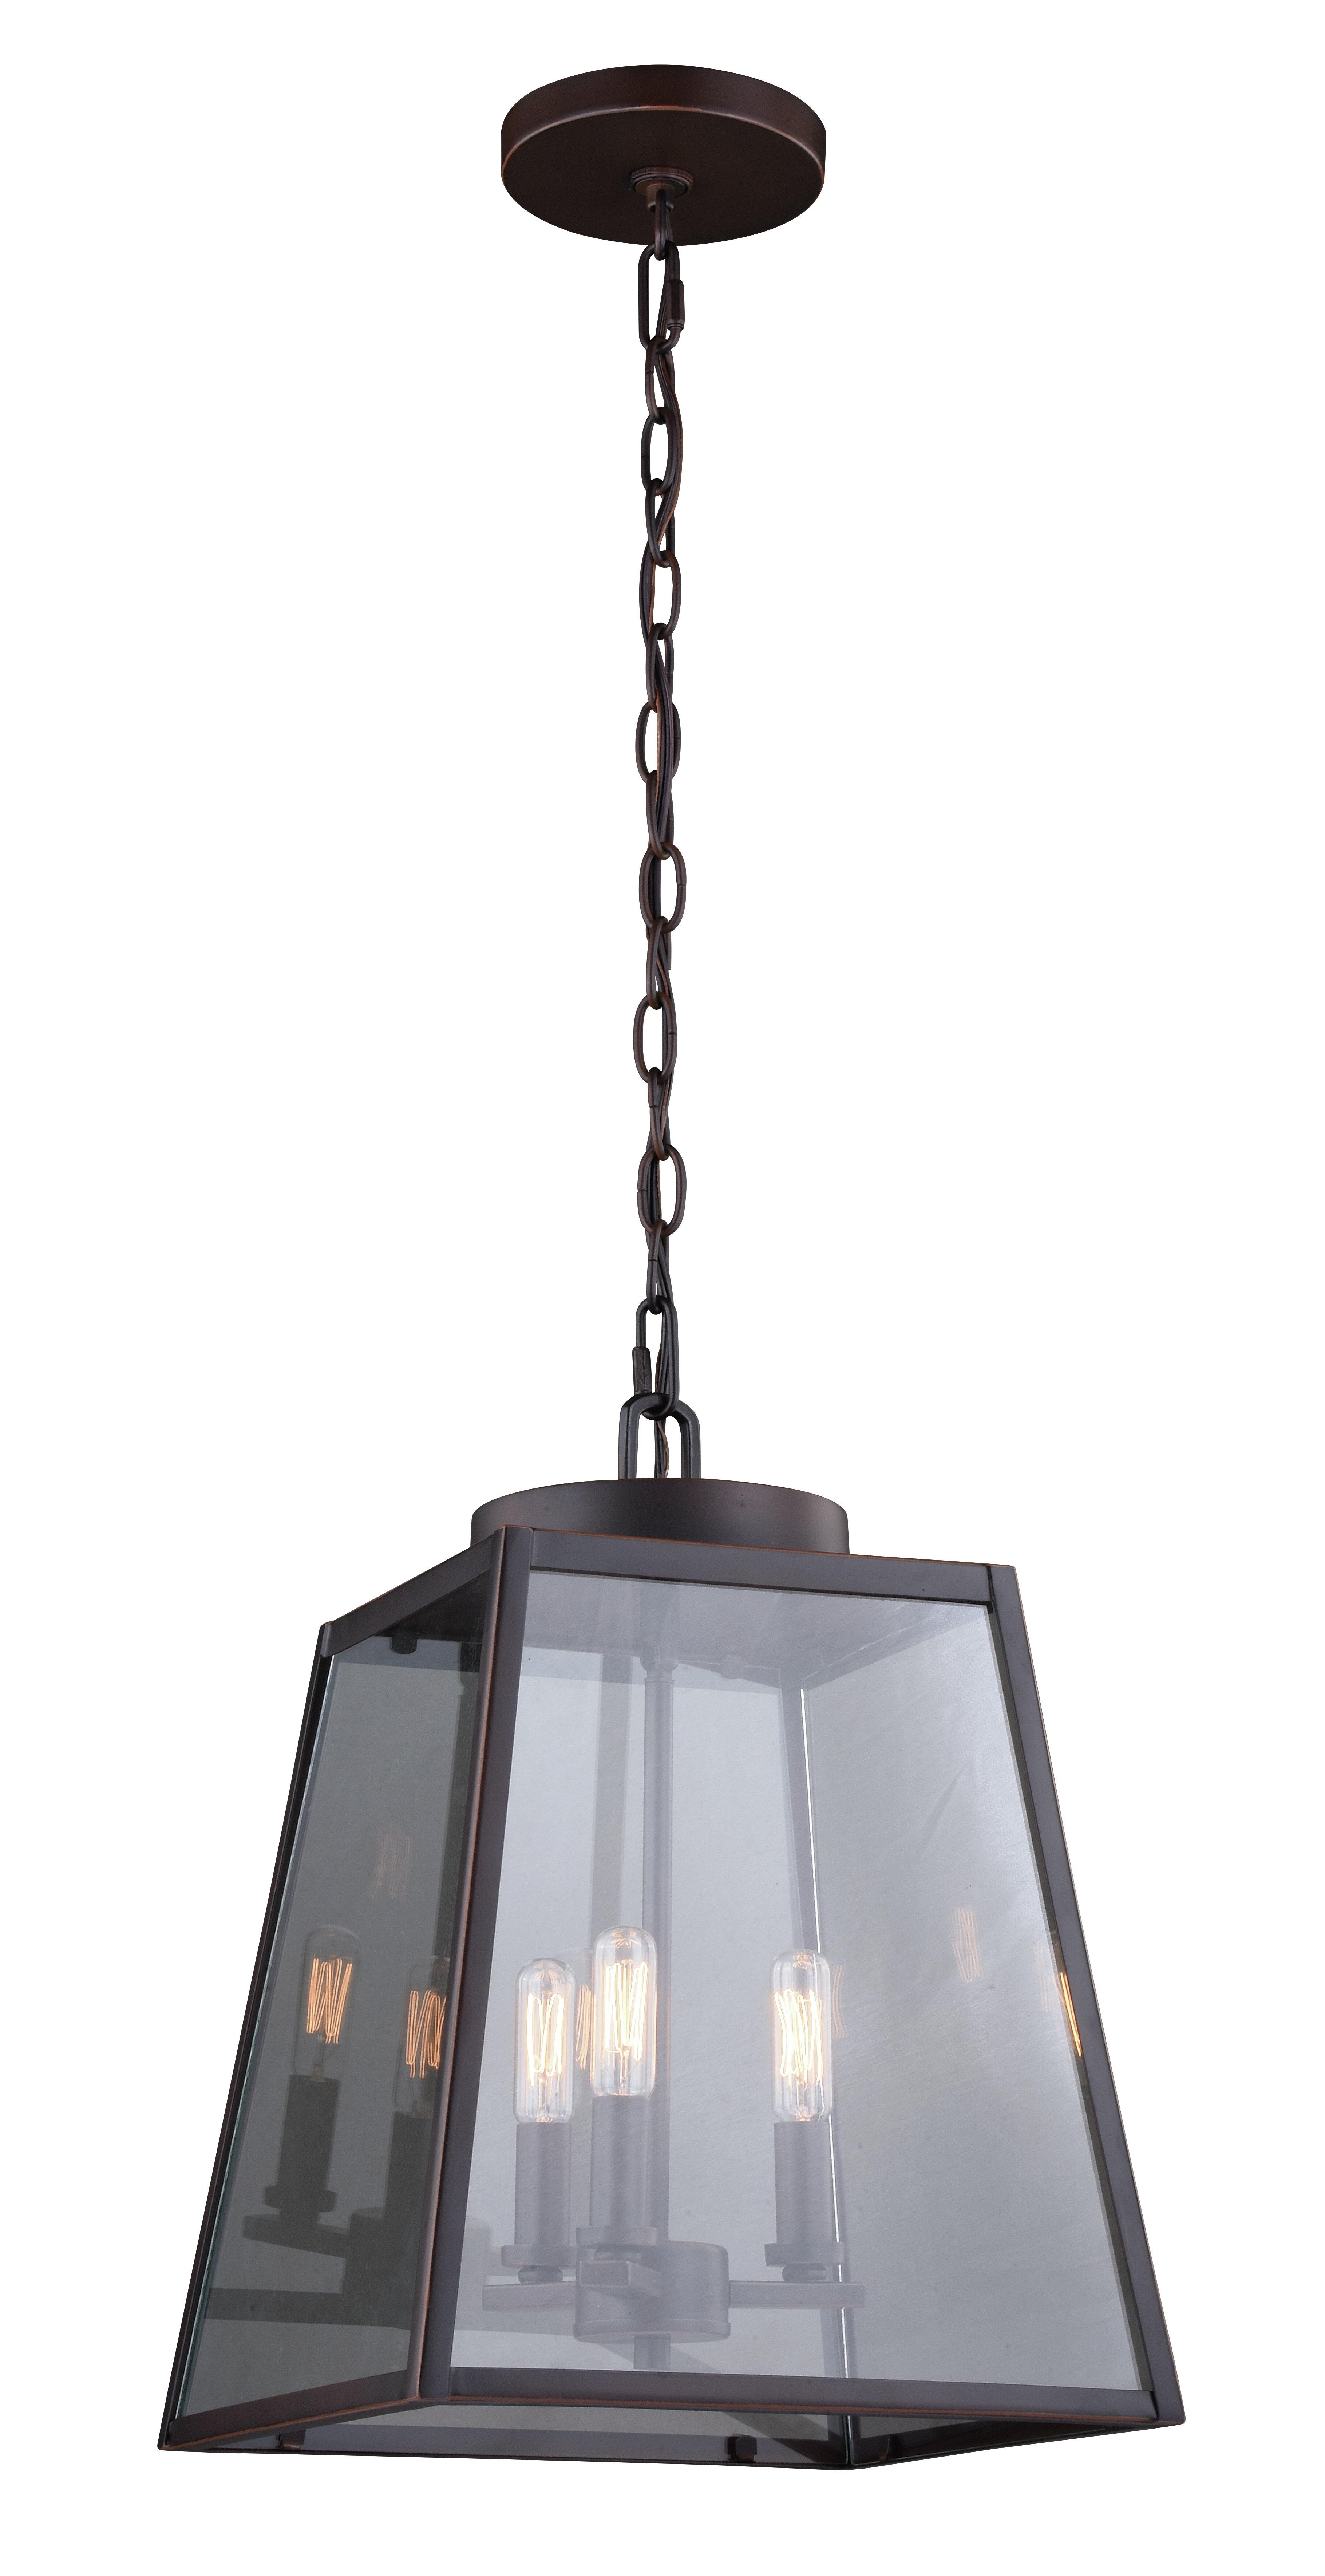 Delon 1 Light Lantern Geometric Pendants Within Favorite Louanne 3 Light Lantern Geometric Pendant & Reviews (Gallery 19 of 25)